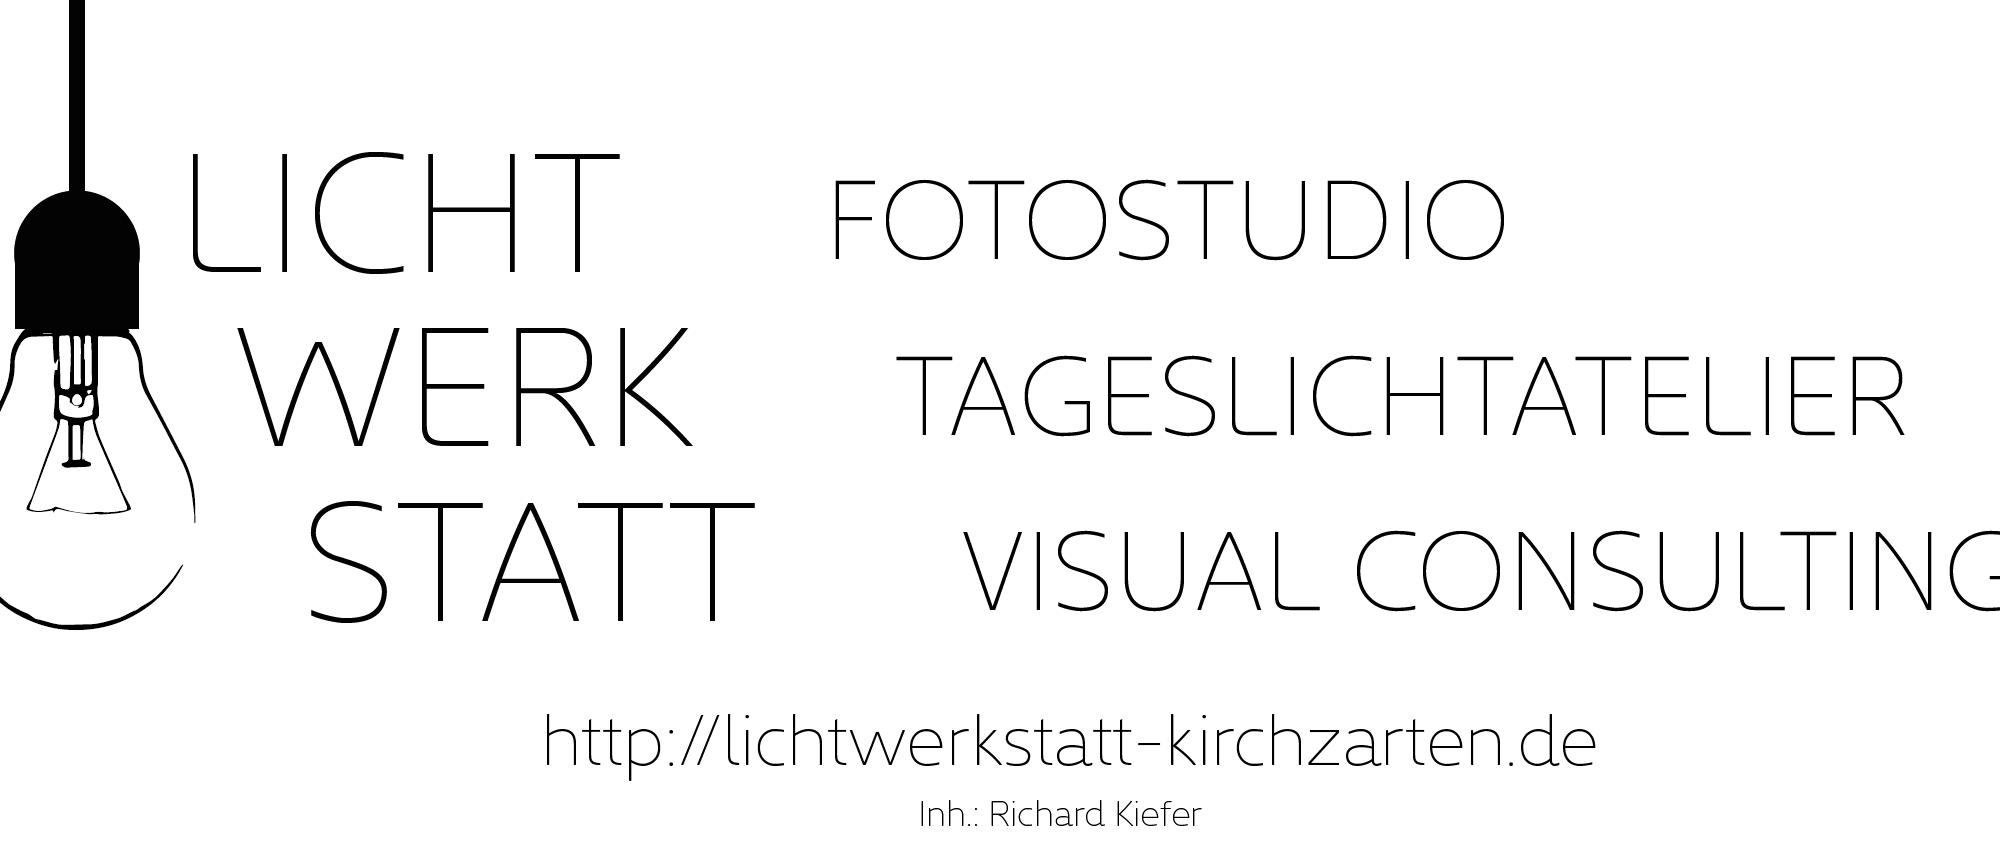 Lichtwerkstatt Kirchzarten, Fotostudio, Fotograf, Fotoatelier, Kirchzarten, Dreisamtal, Buchenbach, Stegen, Zarten, Südbaden, Freiburg, Fotografie, Praktikum, Model werden